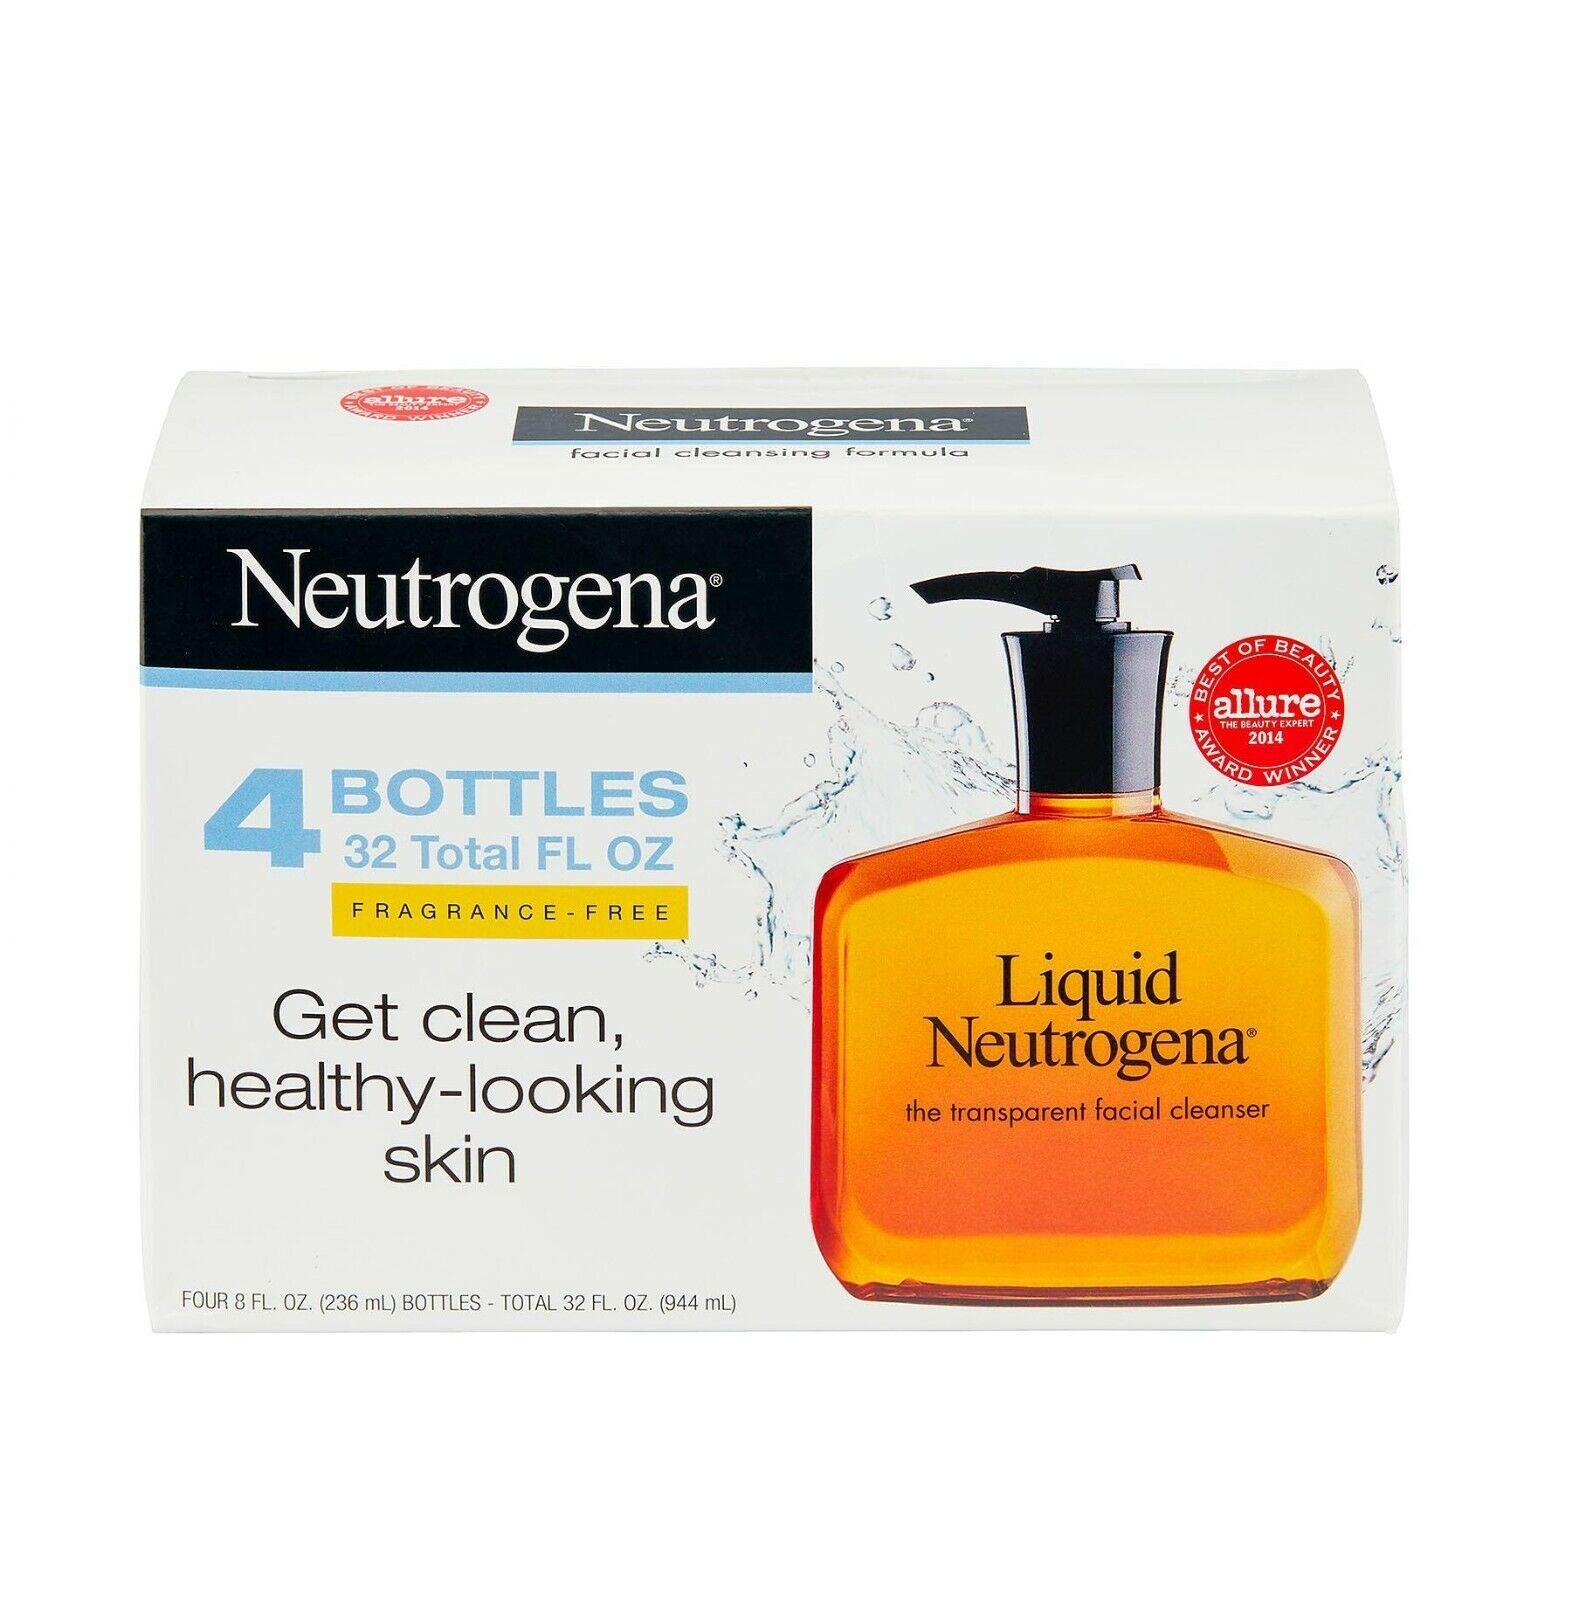 Neutrogena Fragrance Free Liquid Neutrogena, Facial Cleansin